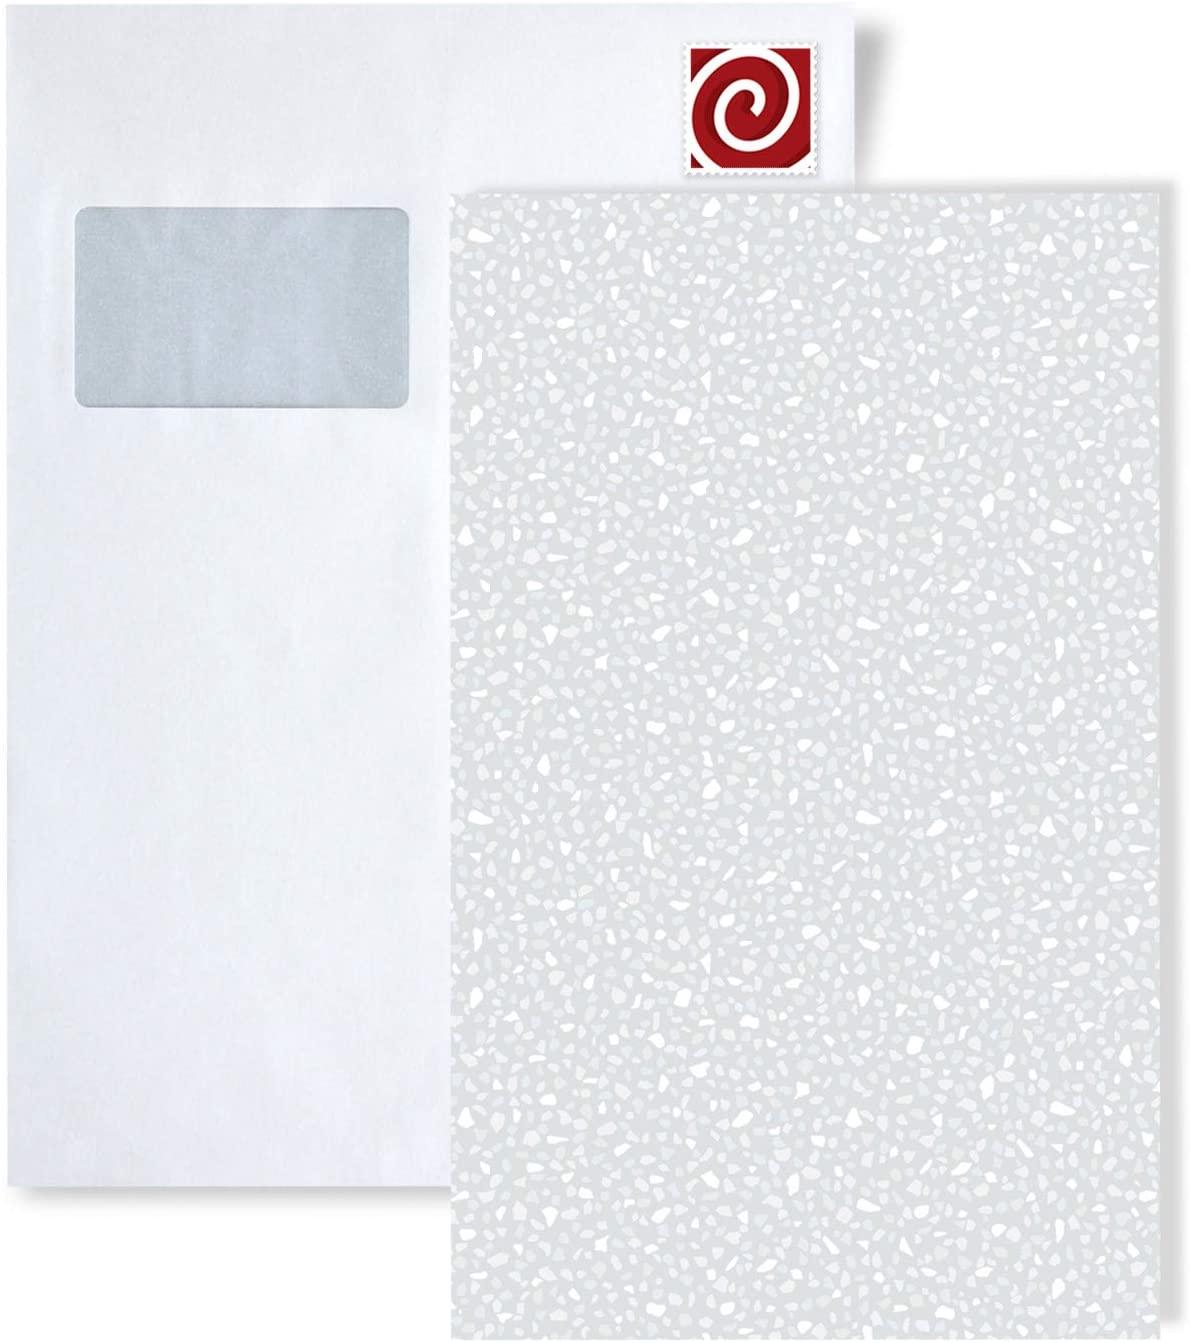 1 Sample Piece S-VD219121-DI Profhome Elegant Stone Look unicolour Wallpaper Sample in DIN A4 Size